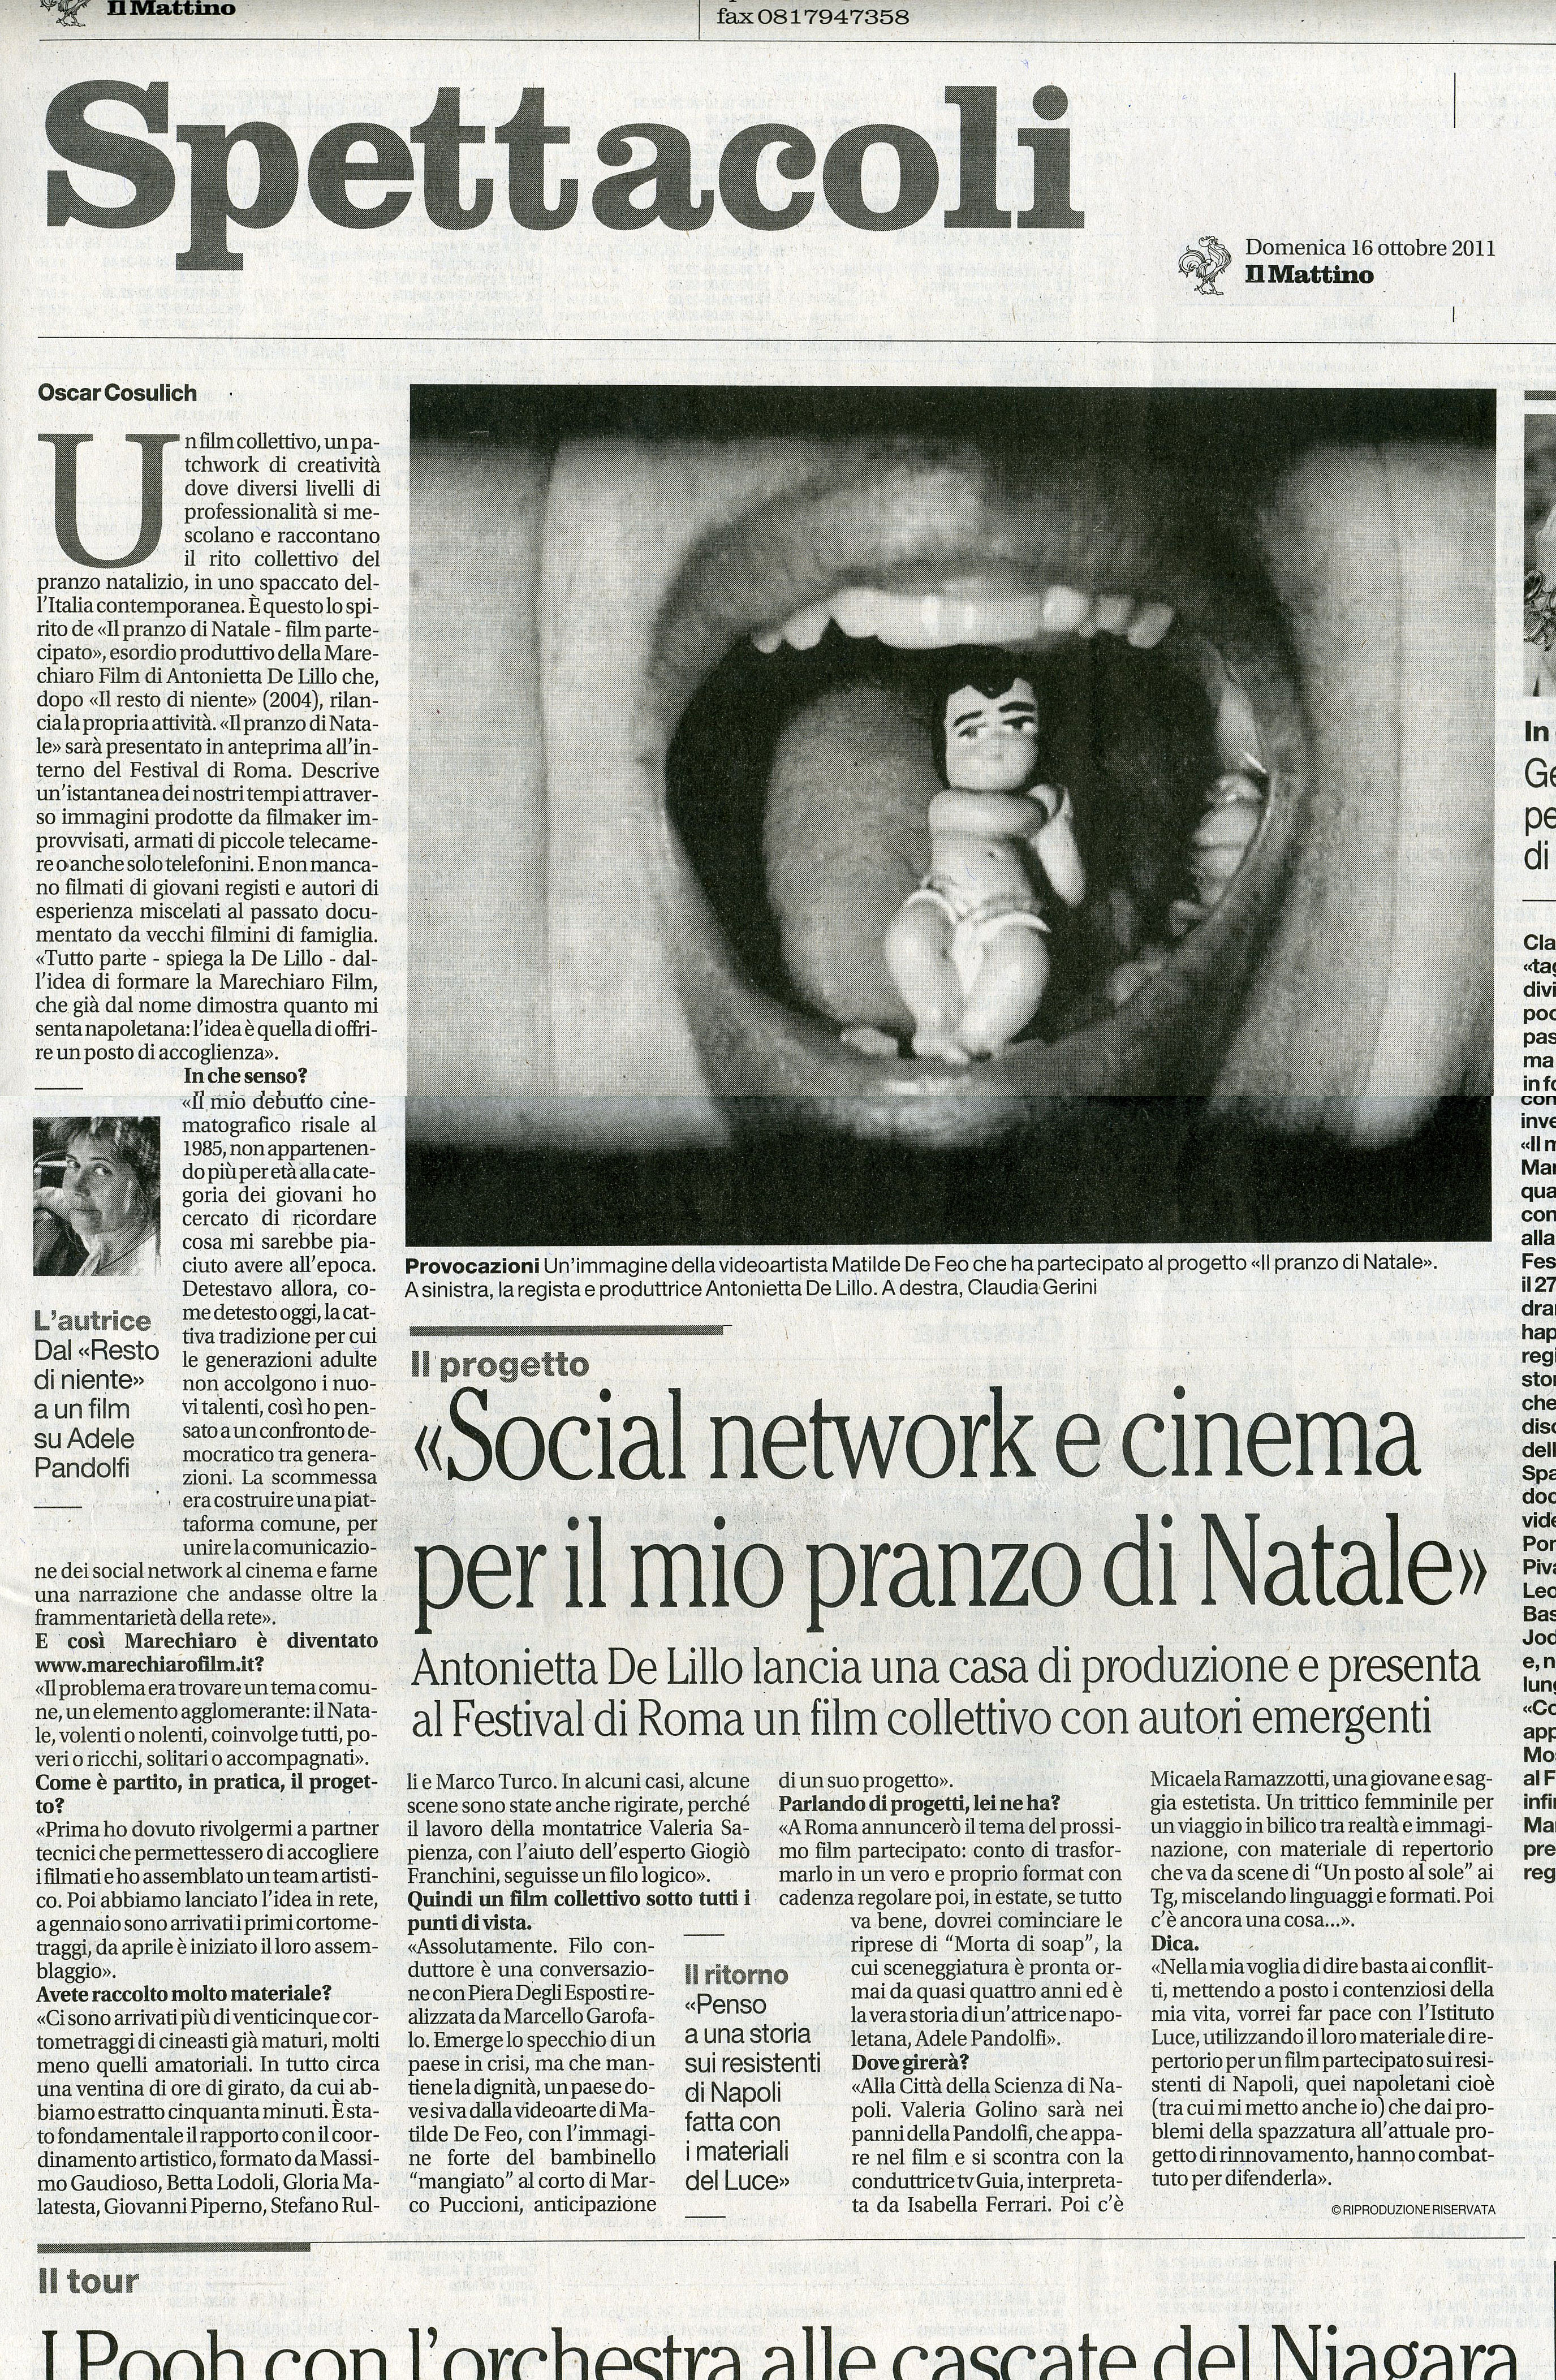 2011 - 16 OTTOBRE IL MATTINO